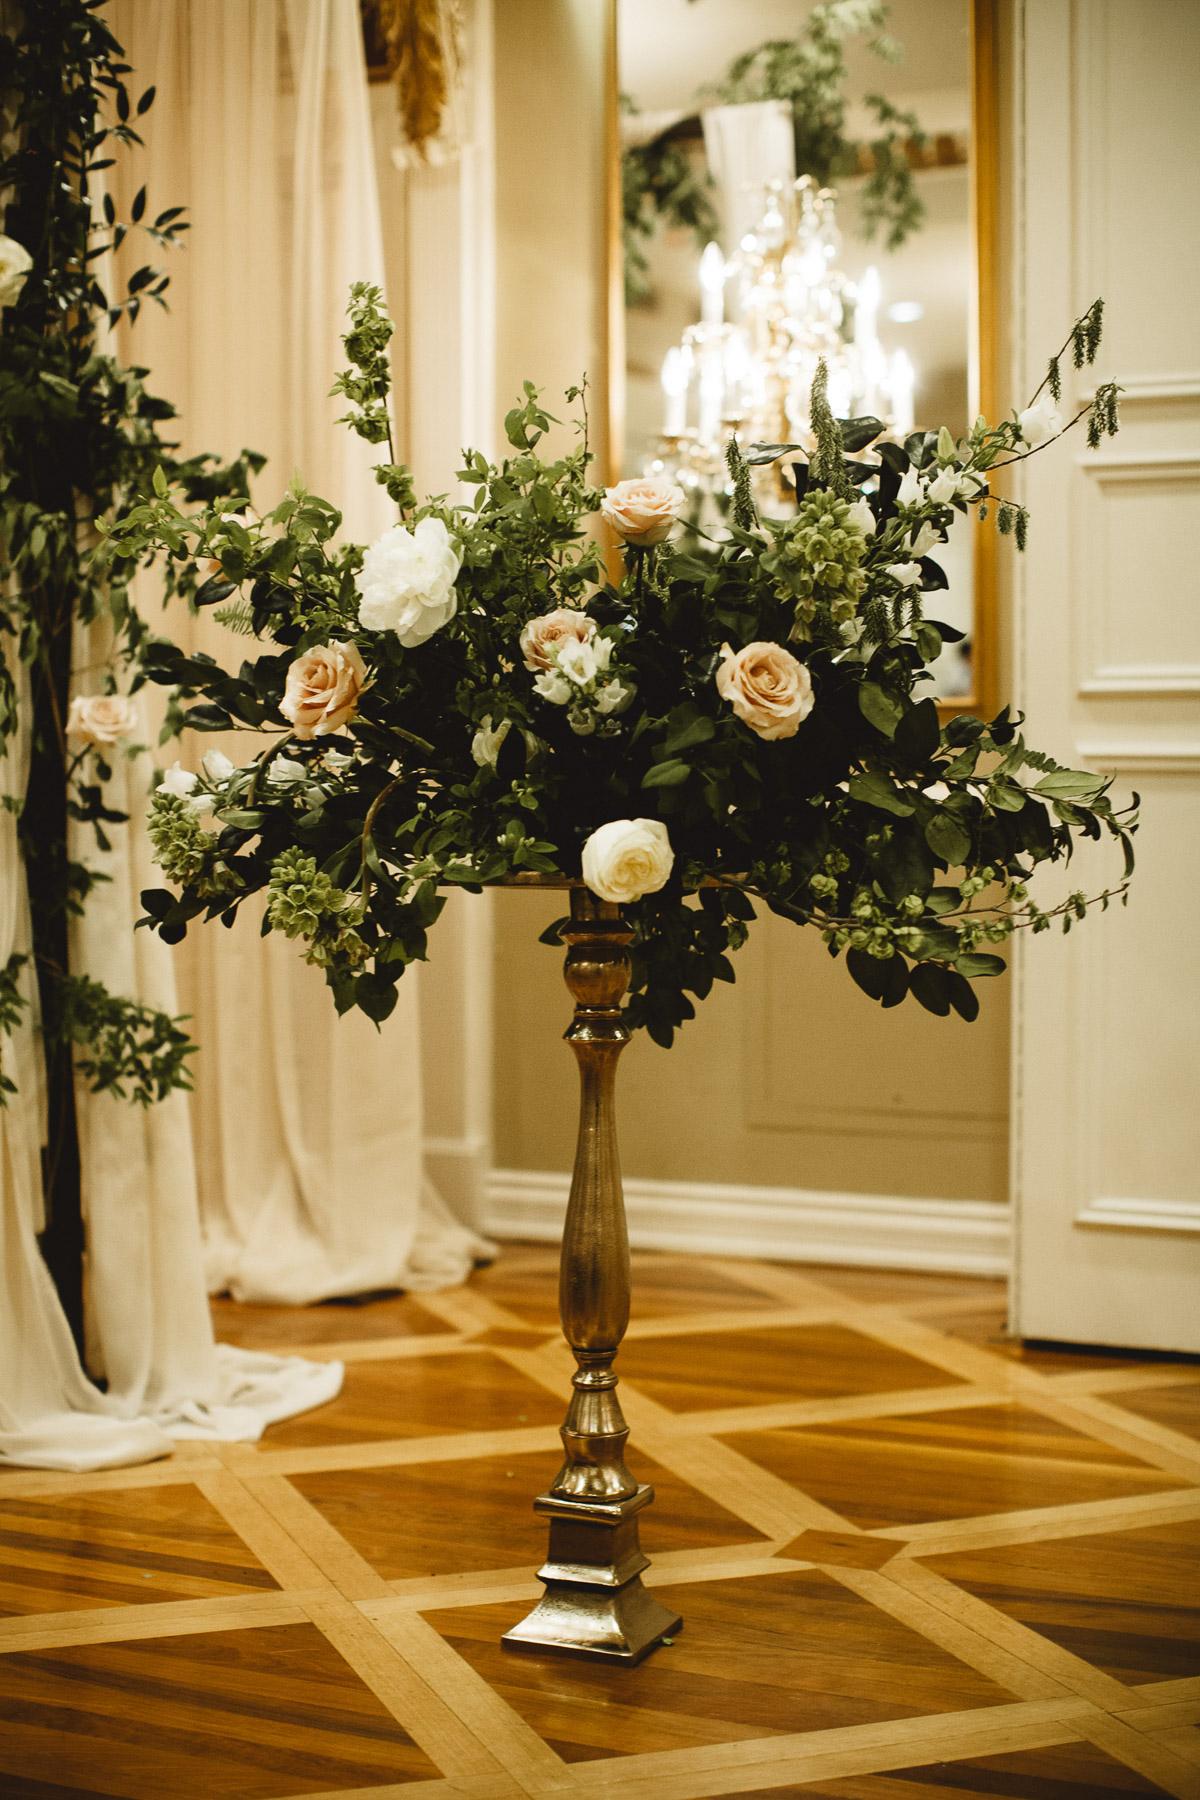 reed-photography-vineyard-bride-swish-list-queens-landing-niagara-on-the-lake-wedding-35.jpg